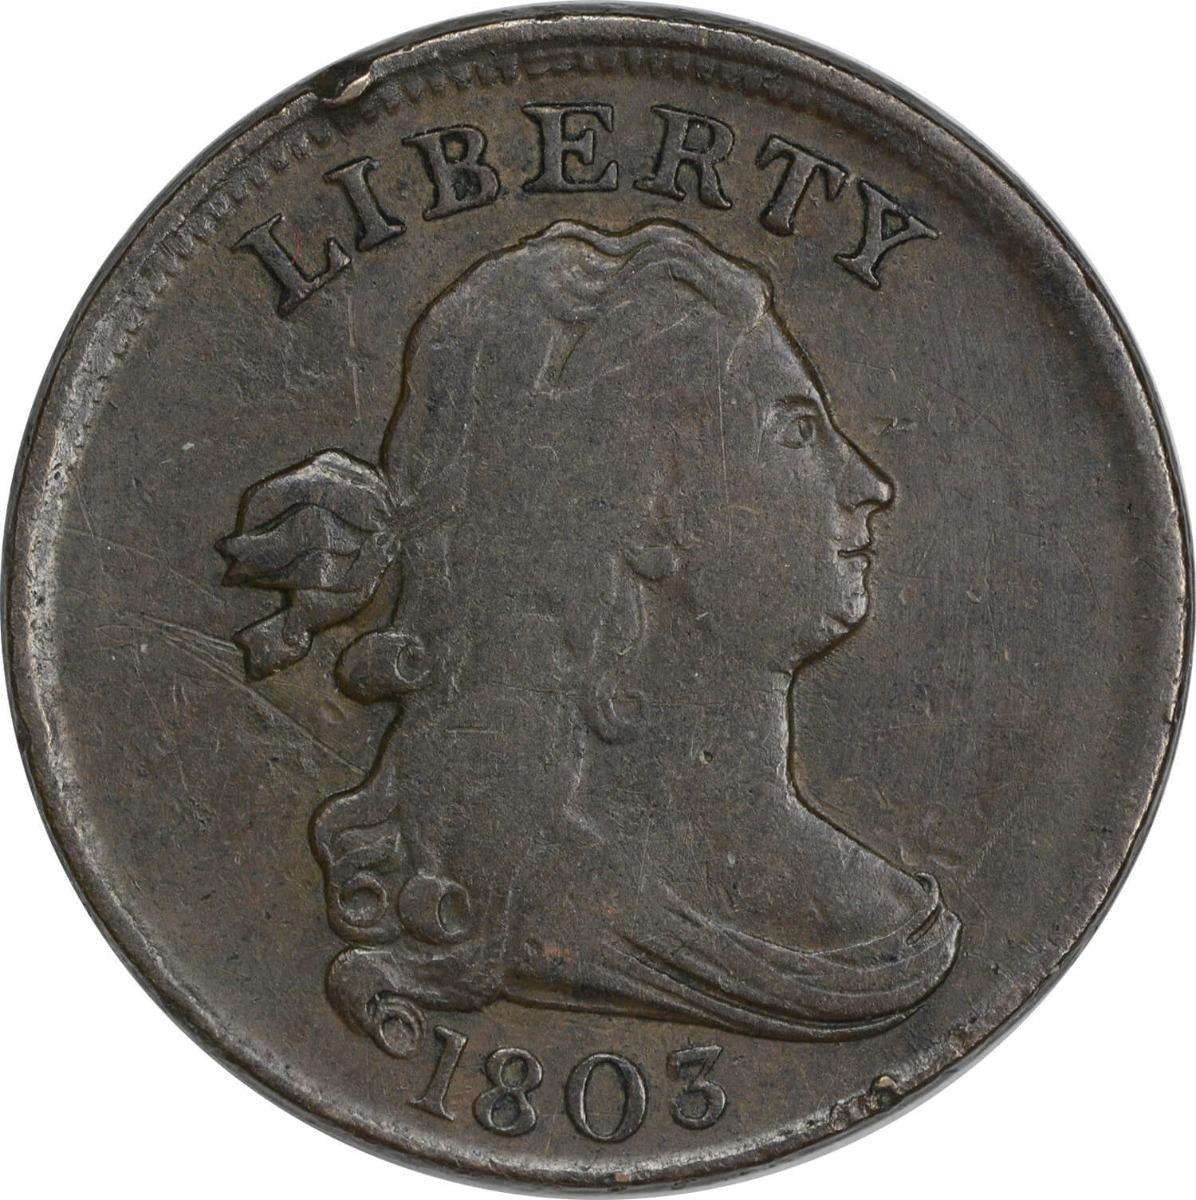 1803 Half Cent VF Uncertified